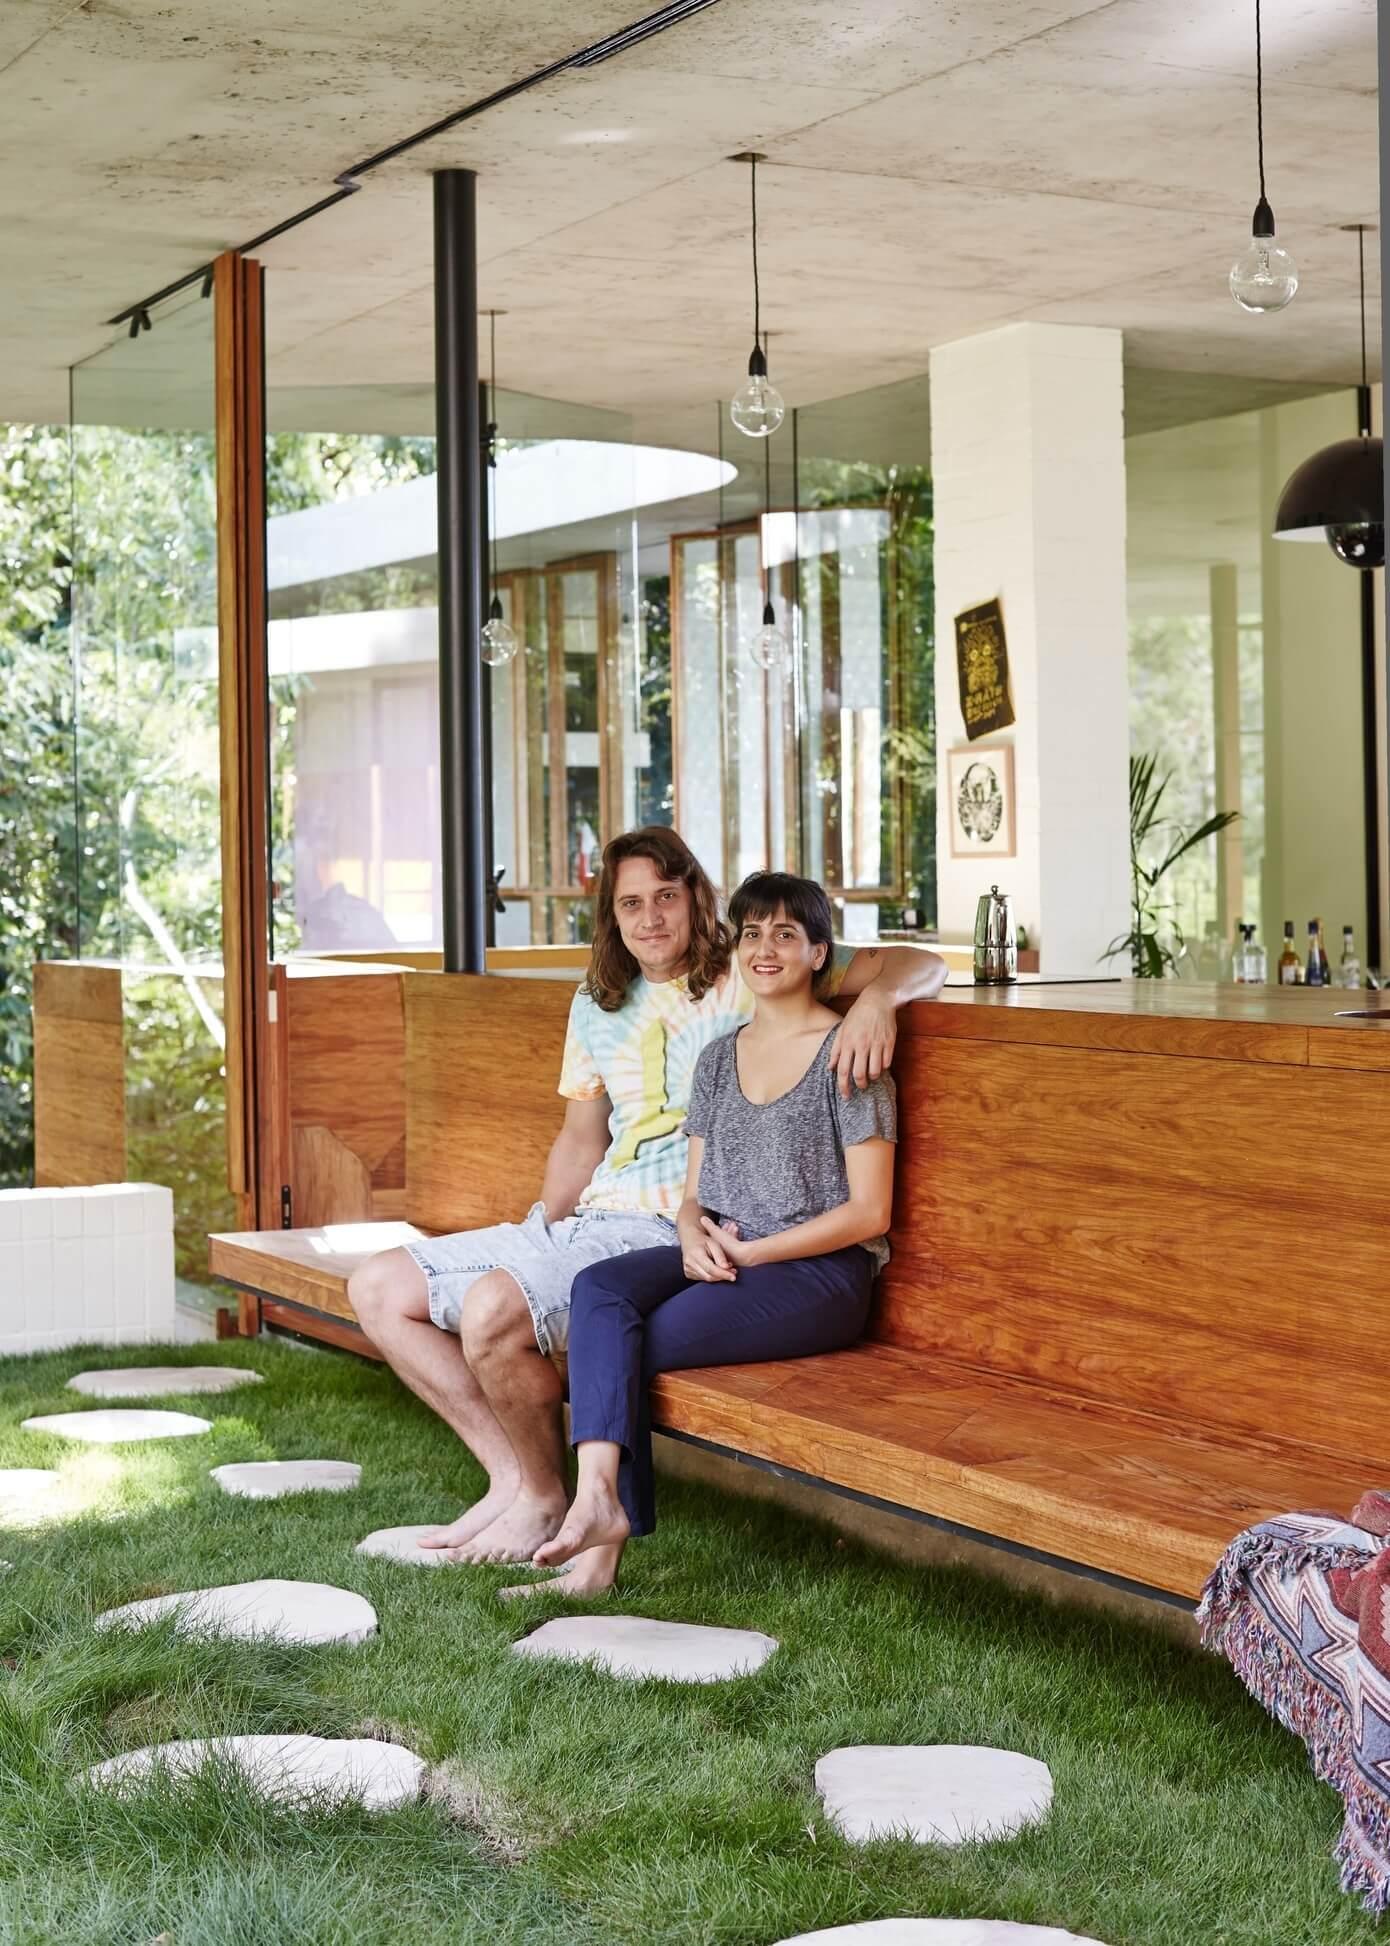 planchonella-house-jesse-bennett-architect-23